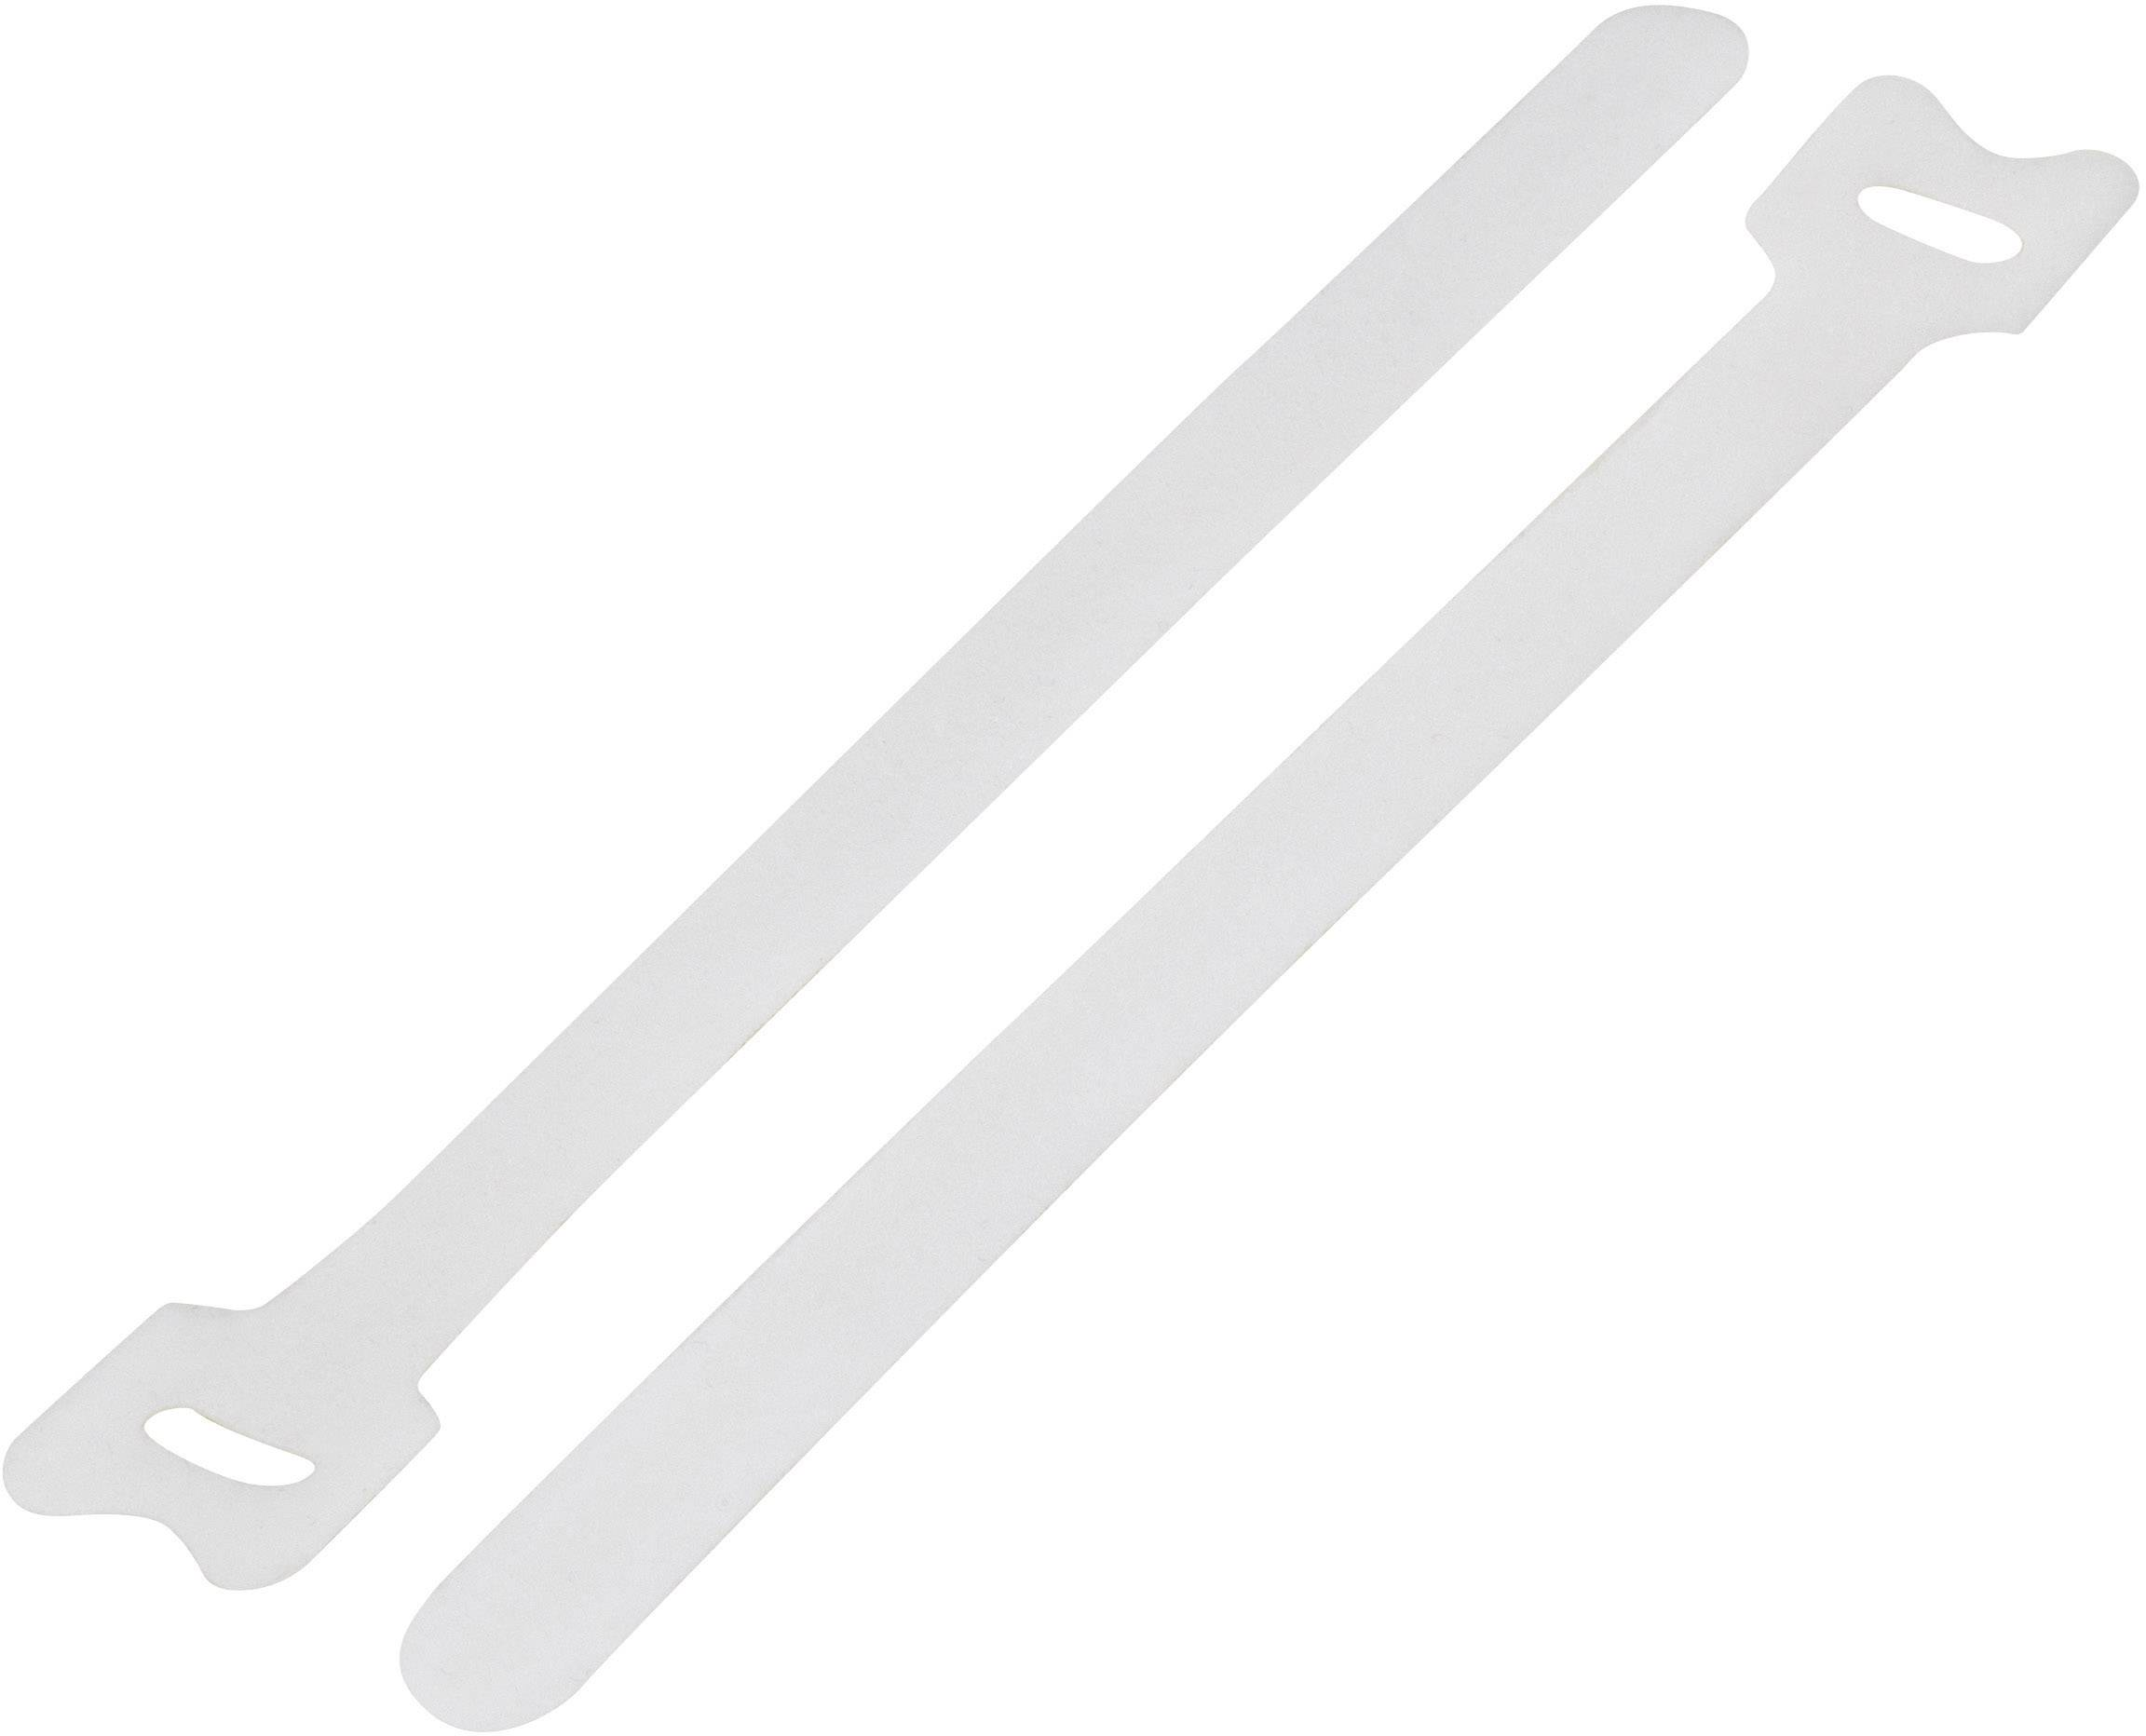 Kabelový manažer na suchý zip TRU COMPONENTS TC-MGT-180WE203, (d x š) 180 mm x 12 mm, bílá, 1 ks